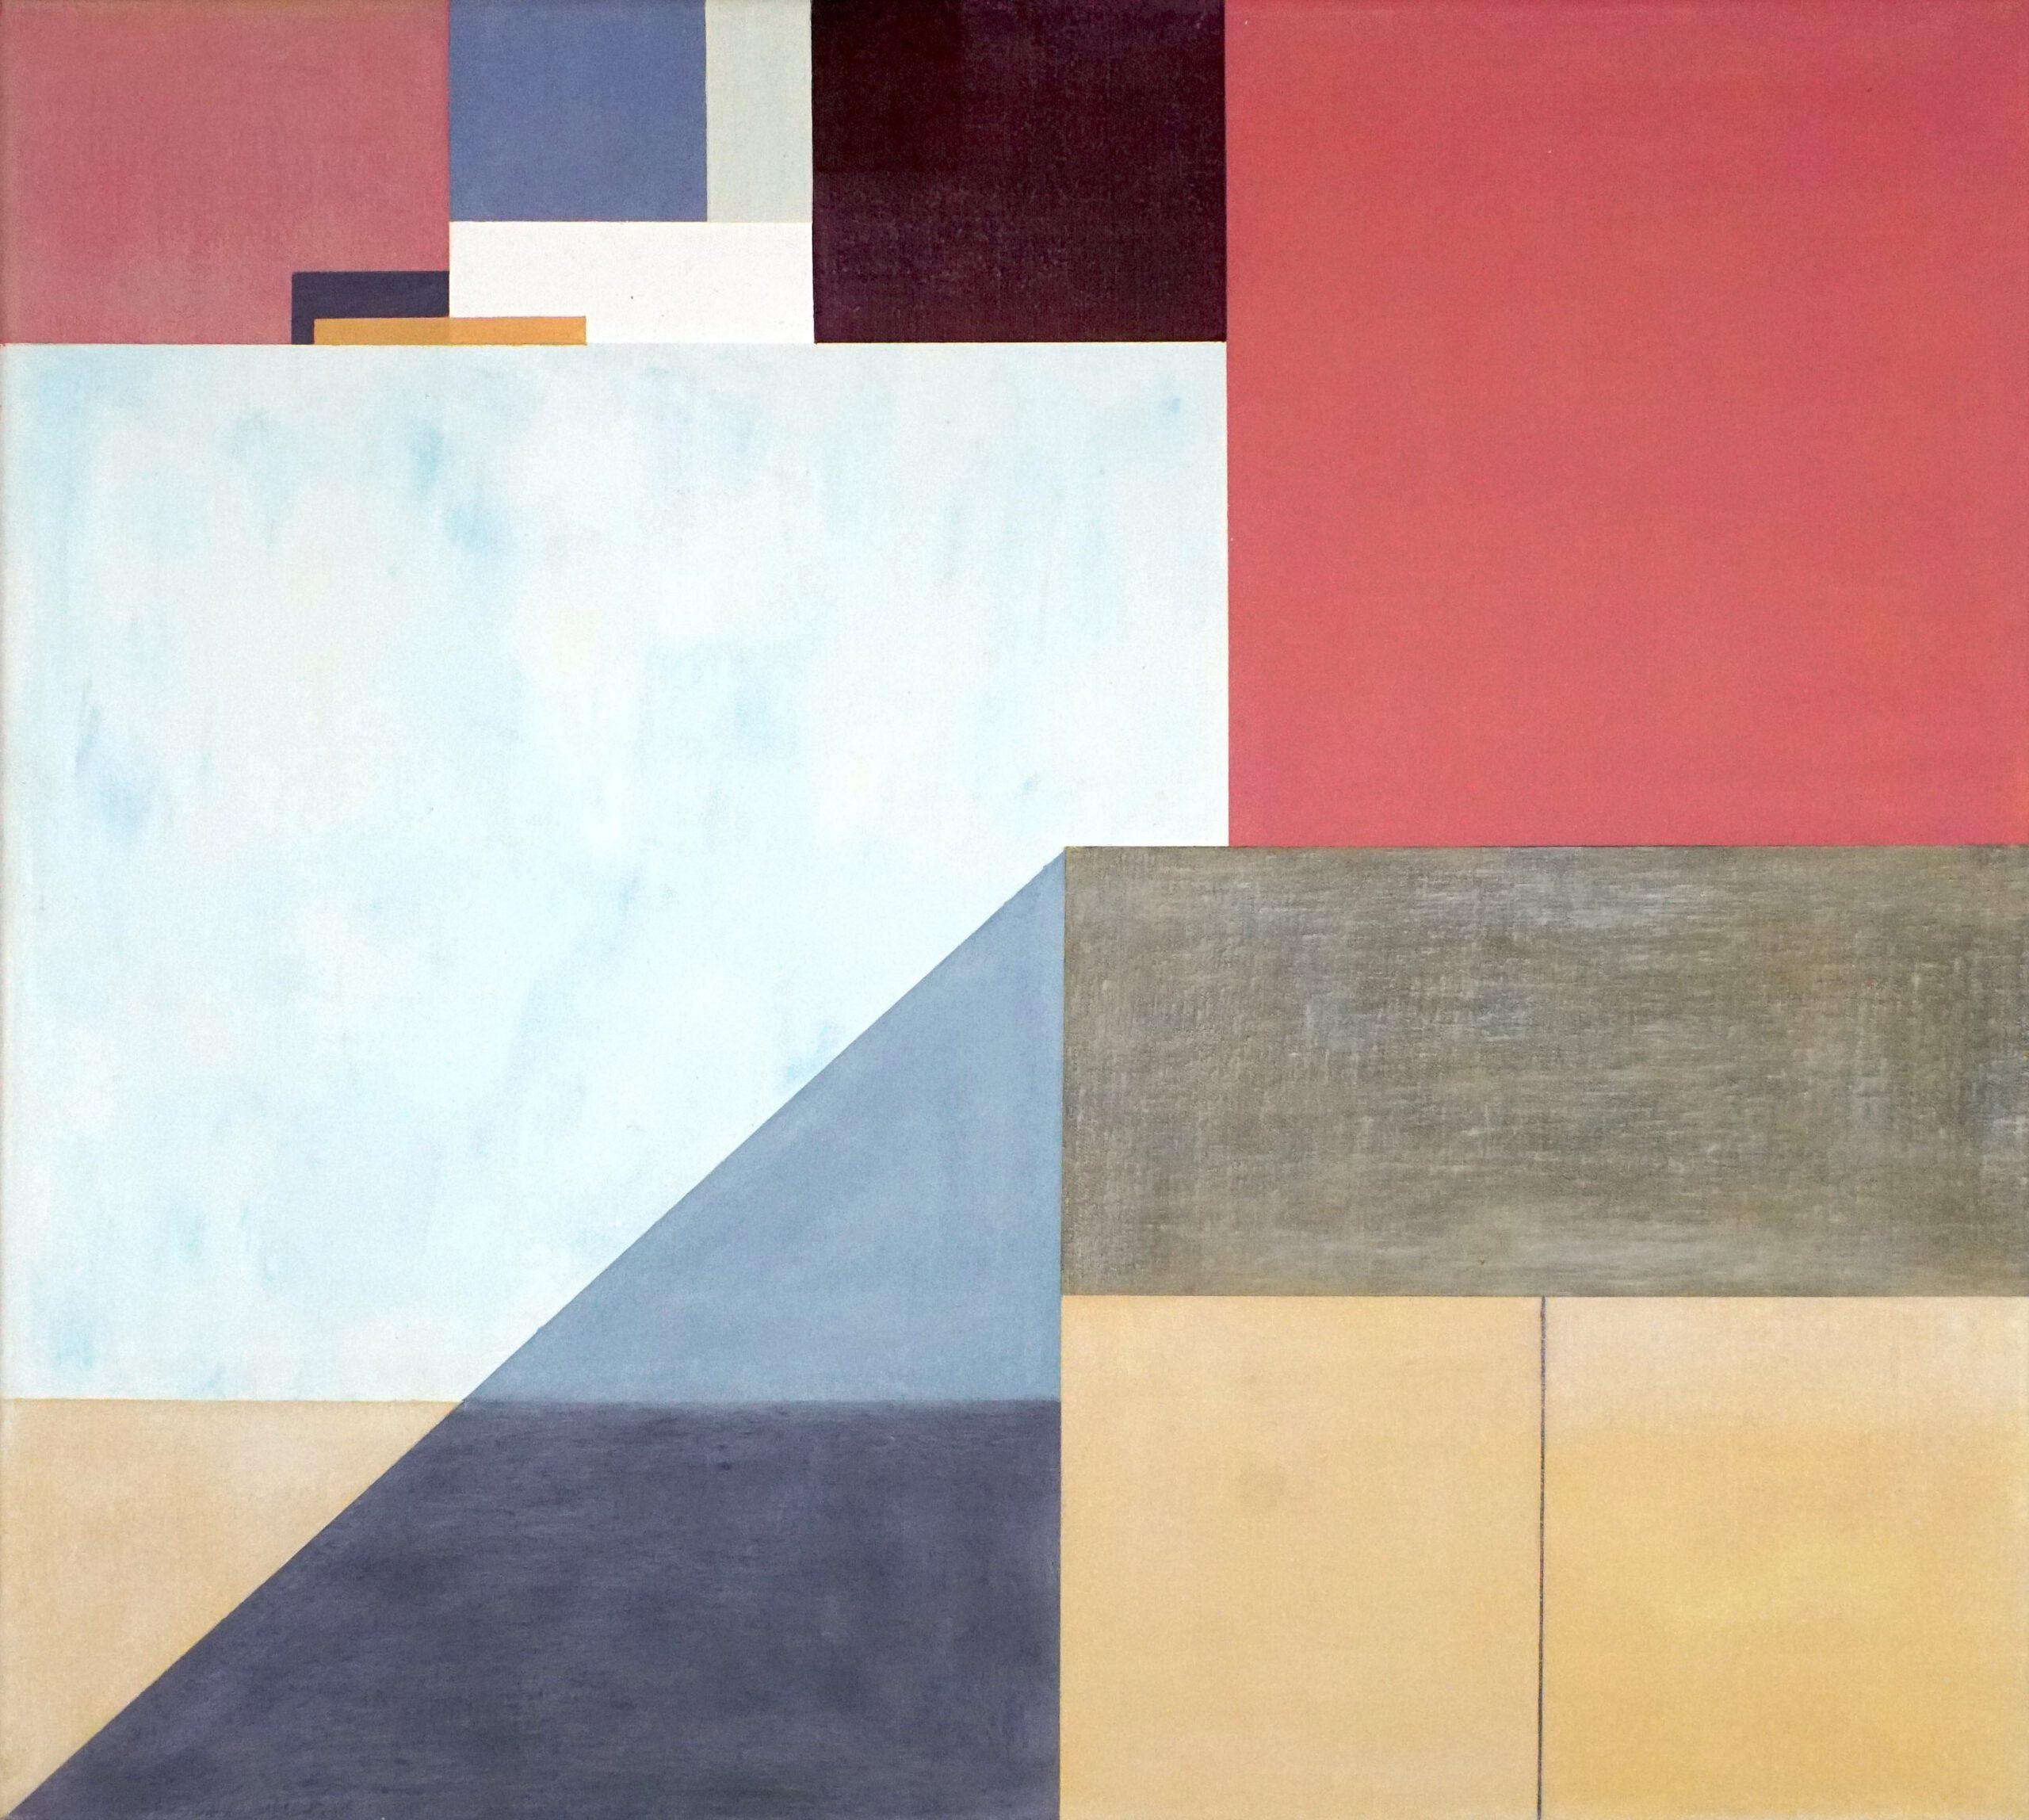 Sidi Ifni I,  2018, 45 x 50 cm, Öl/Lw, Oil on Canvas